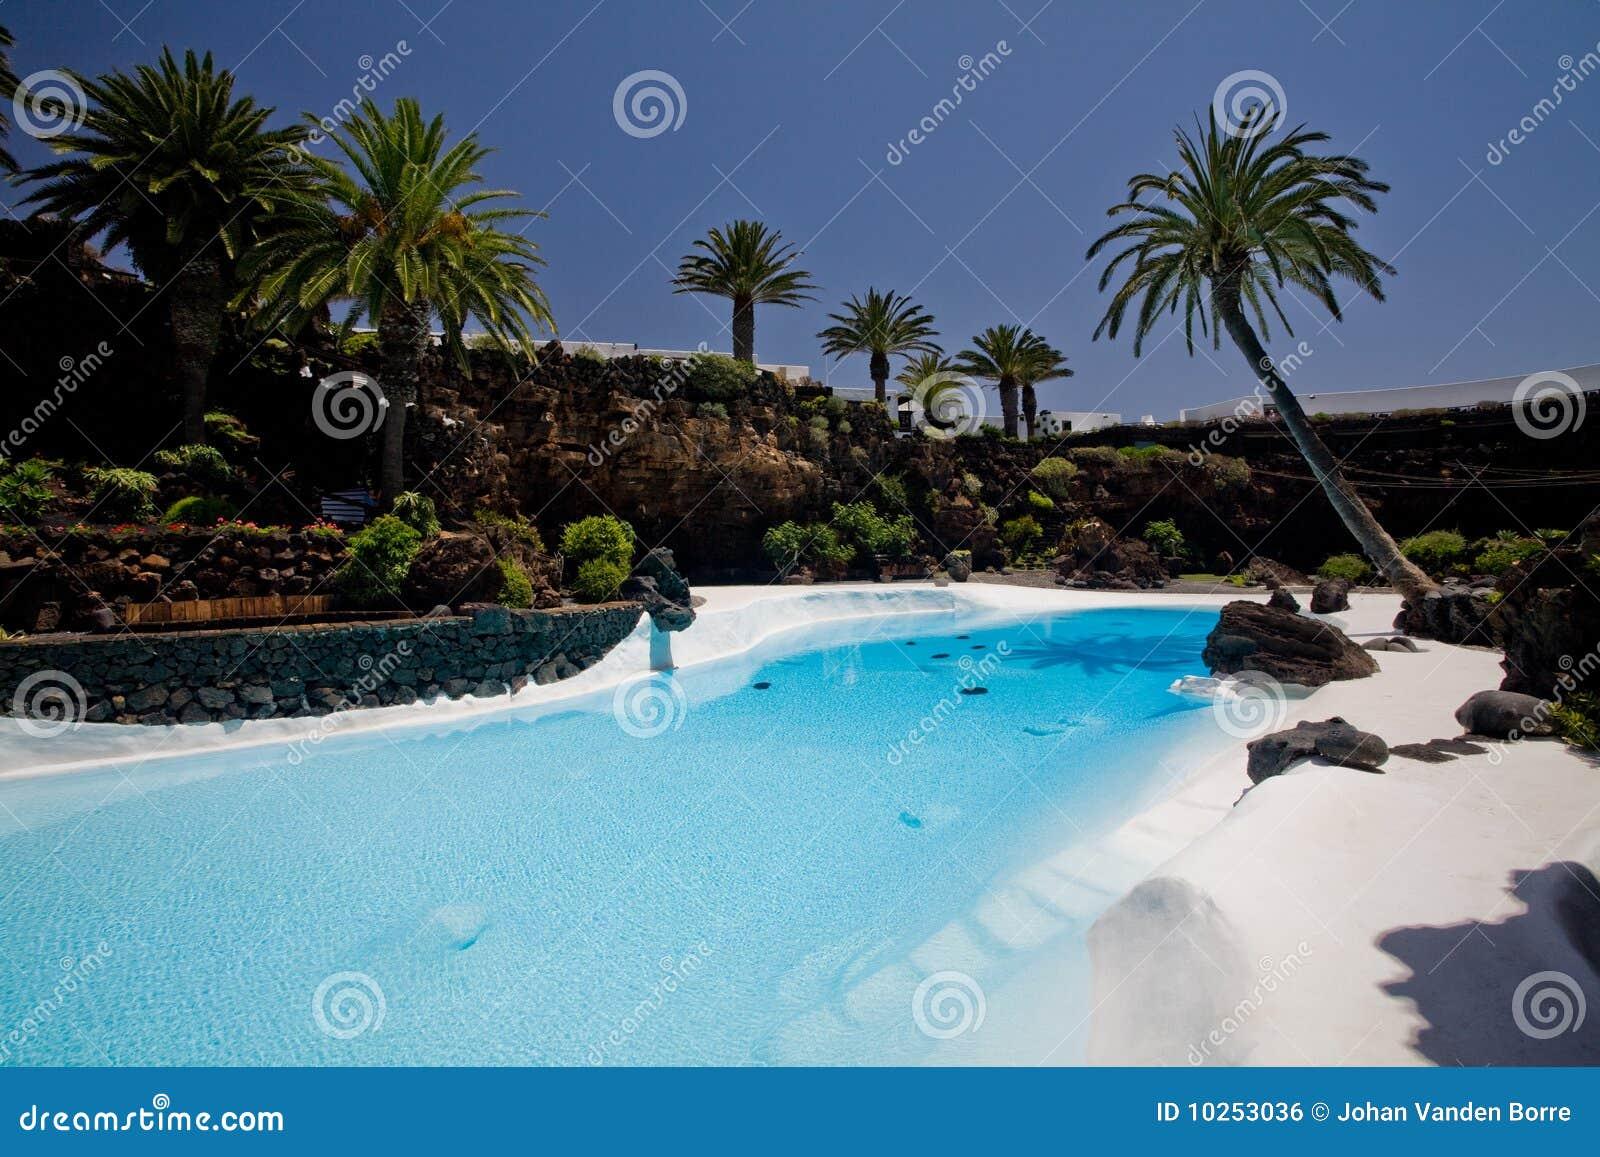 Piscina tropicale immagine stock libera da diritti for Piscina z